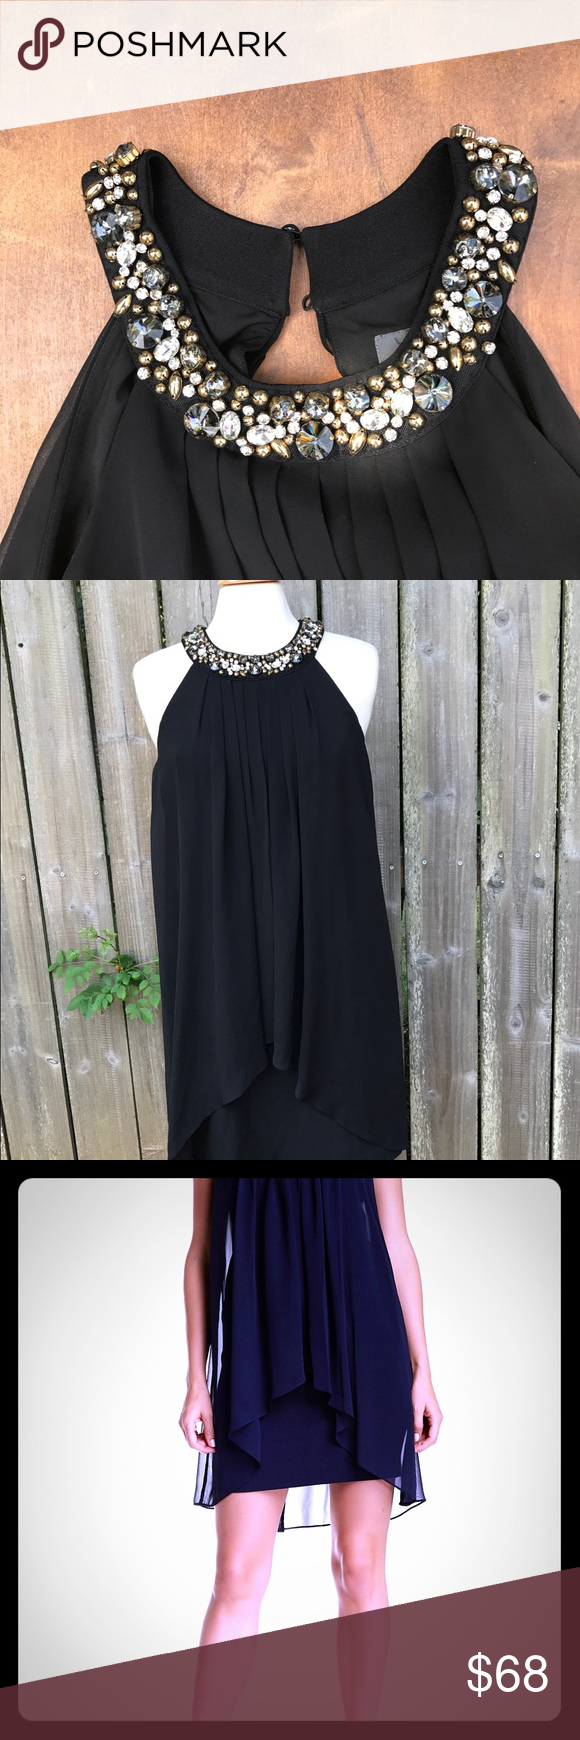 Vince Camuto Black Jeweled Trapeze Dress Lbd Sz 8 Trapeze Dress Dresses Little Black Dress [ 1740 x 580 Pixel ]